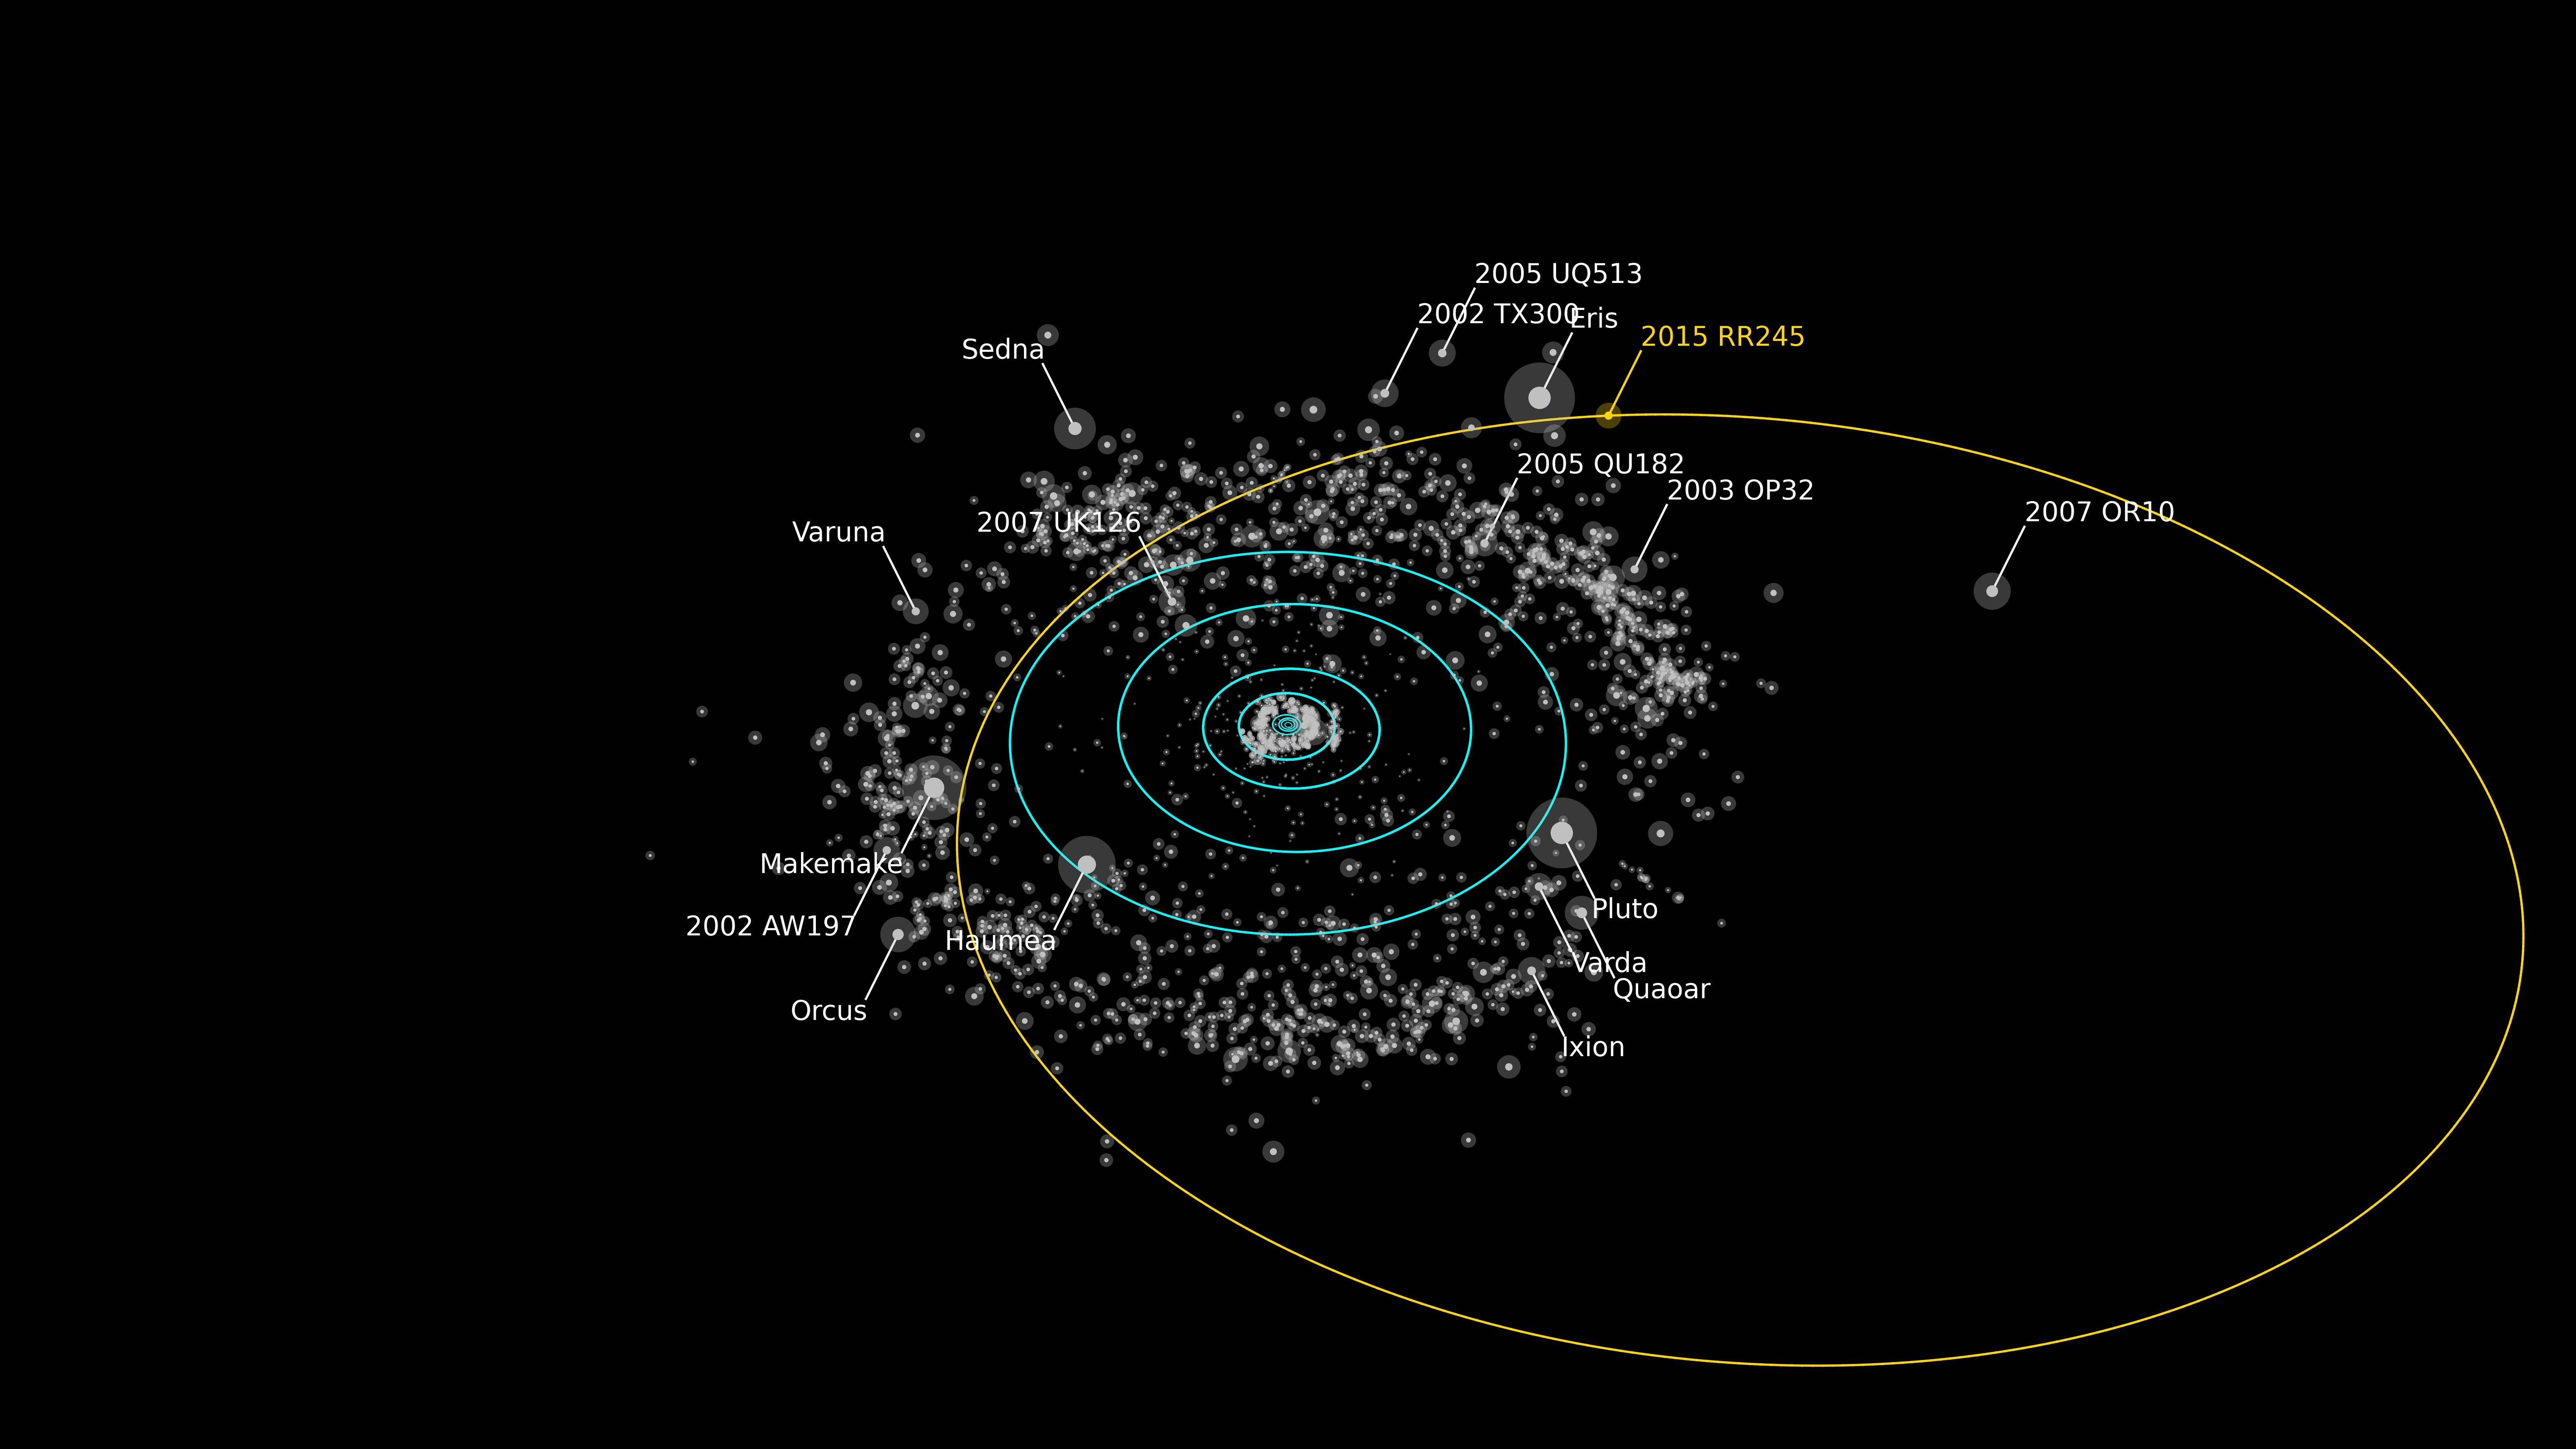 http://www.space.com/images/i/000/056/733/original/dwarf-planet-RR24.jpg?1468249787?interpolation=lanczos-none&downsize=*:1400